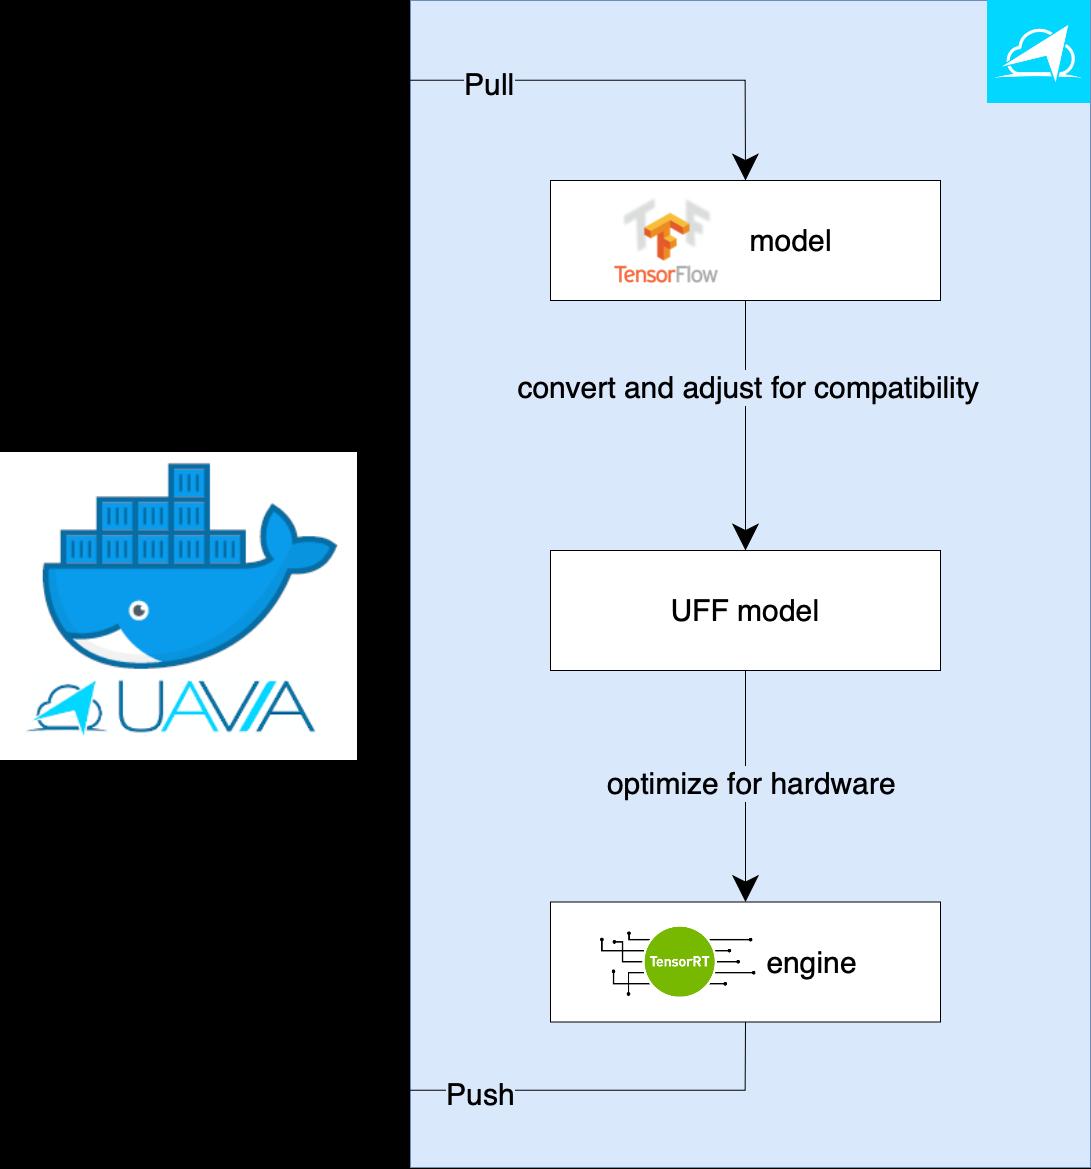 Figure 8:  Flow diagram showing UAVIA's model optimization pipeline for TensorRT.